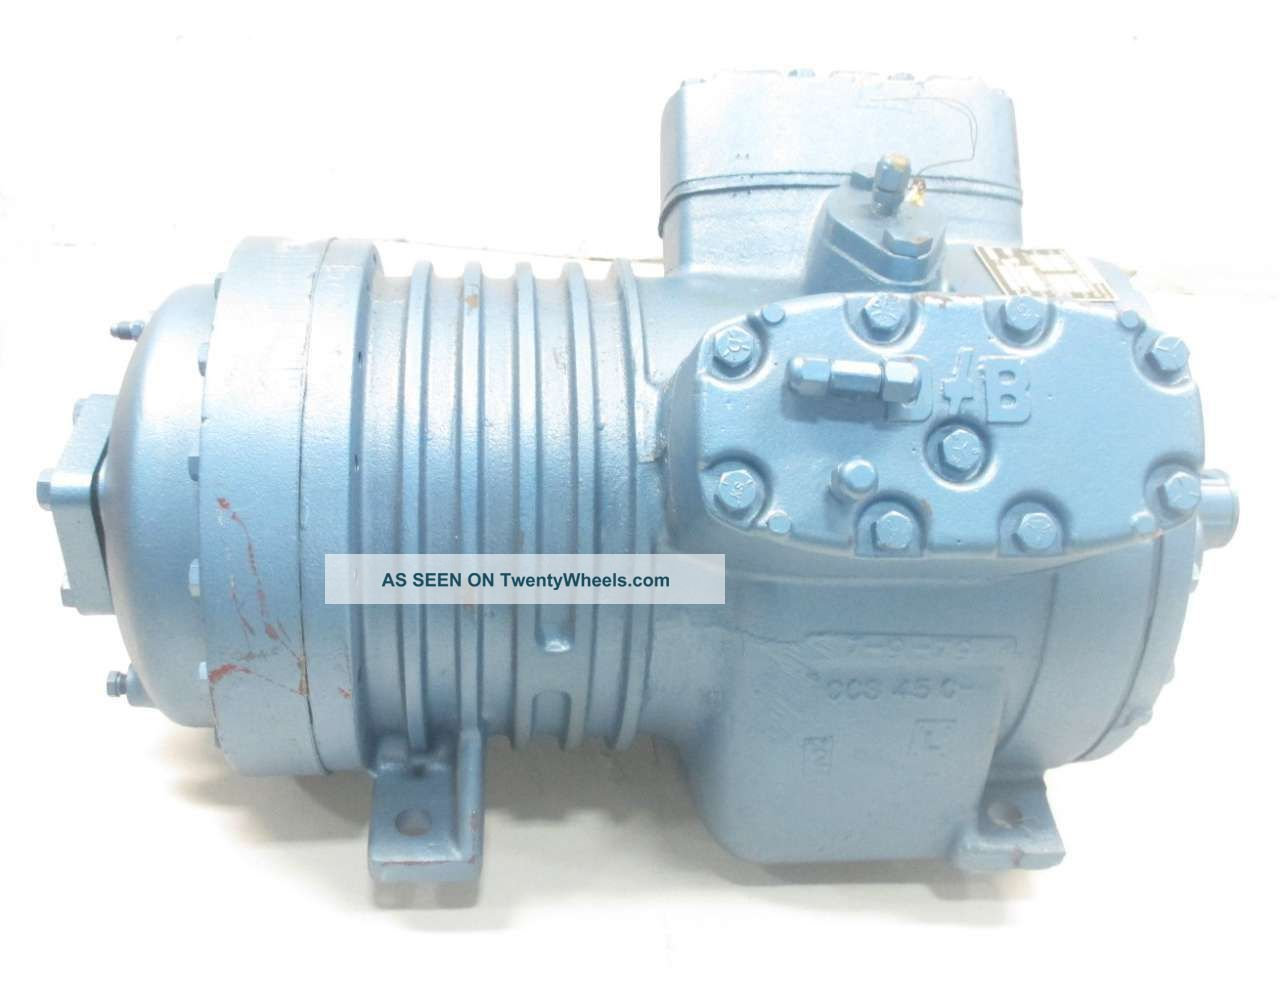 Dunham Bush 151 Phf Air Conditioner Compressor 460v - Ac D453434 Heating & Cooling Equipment photo